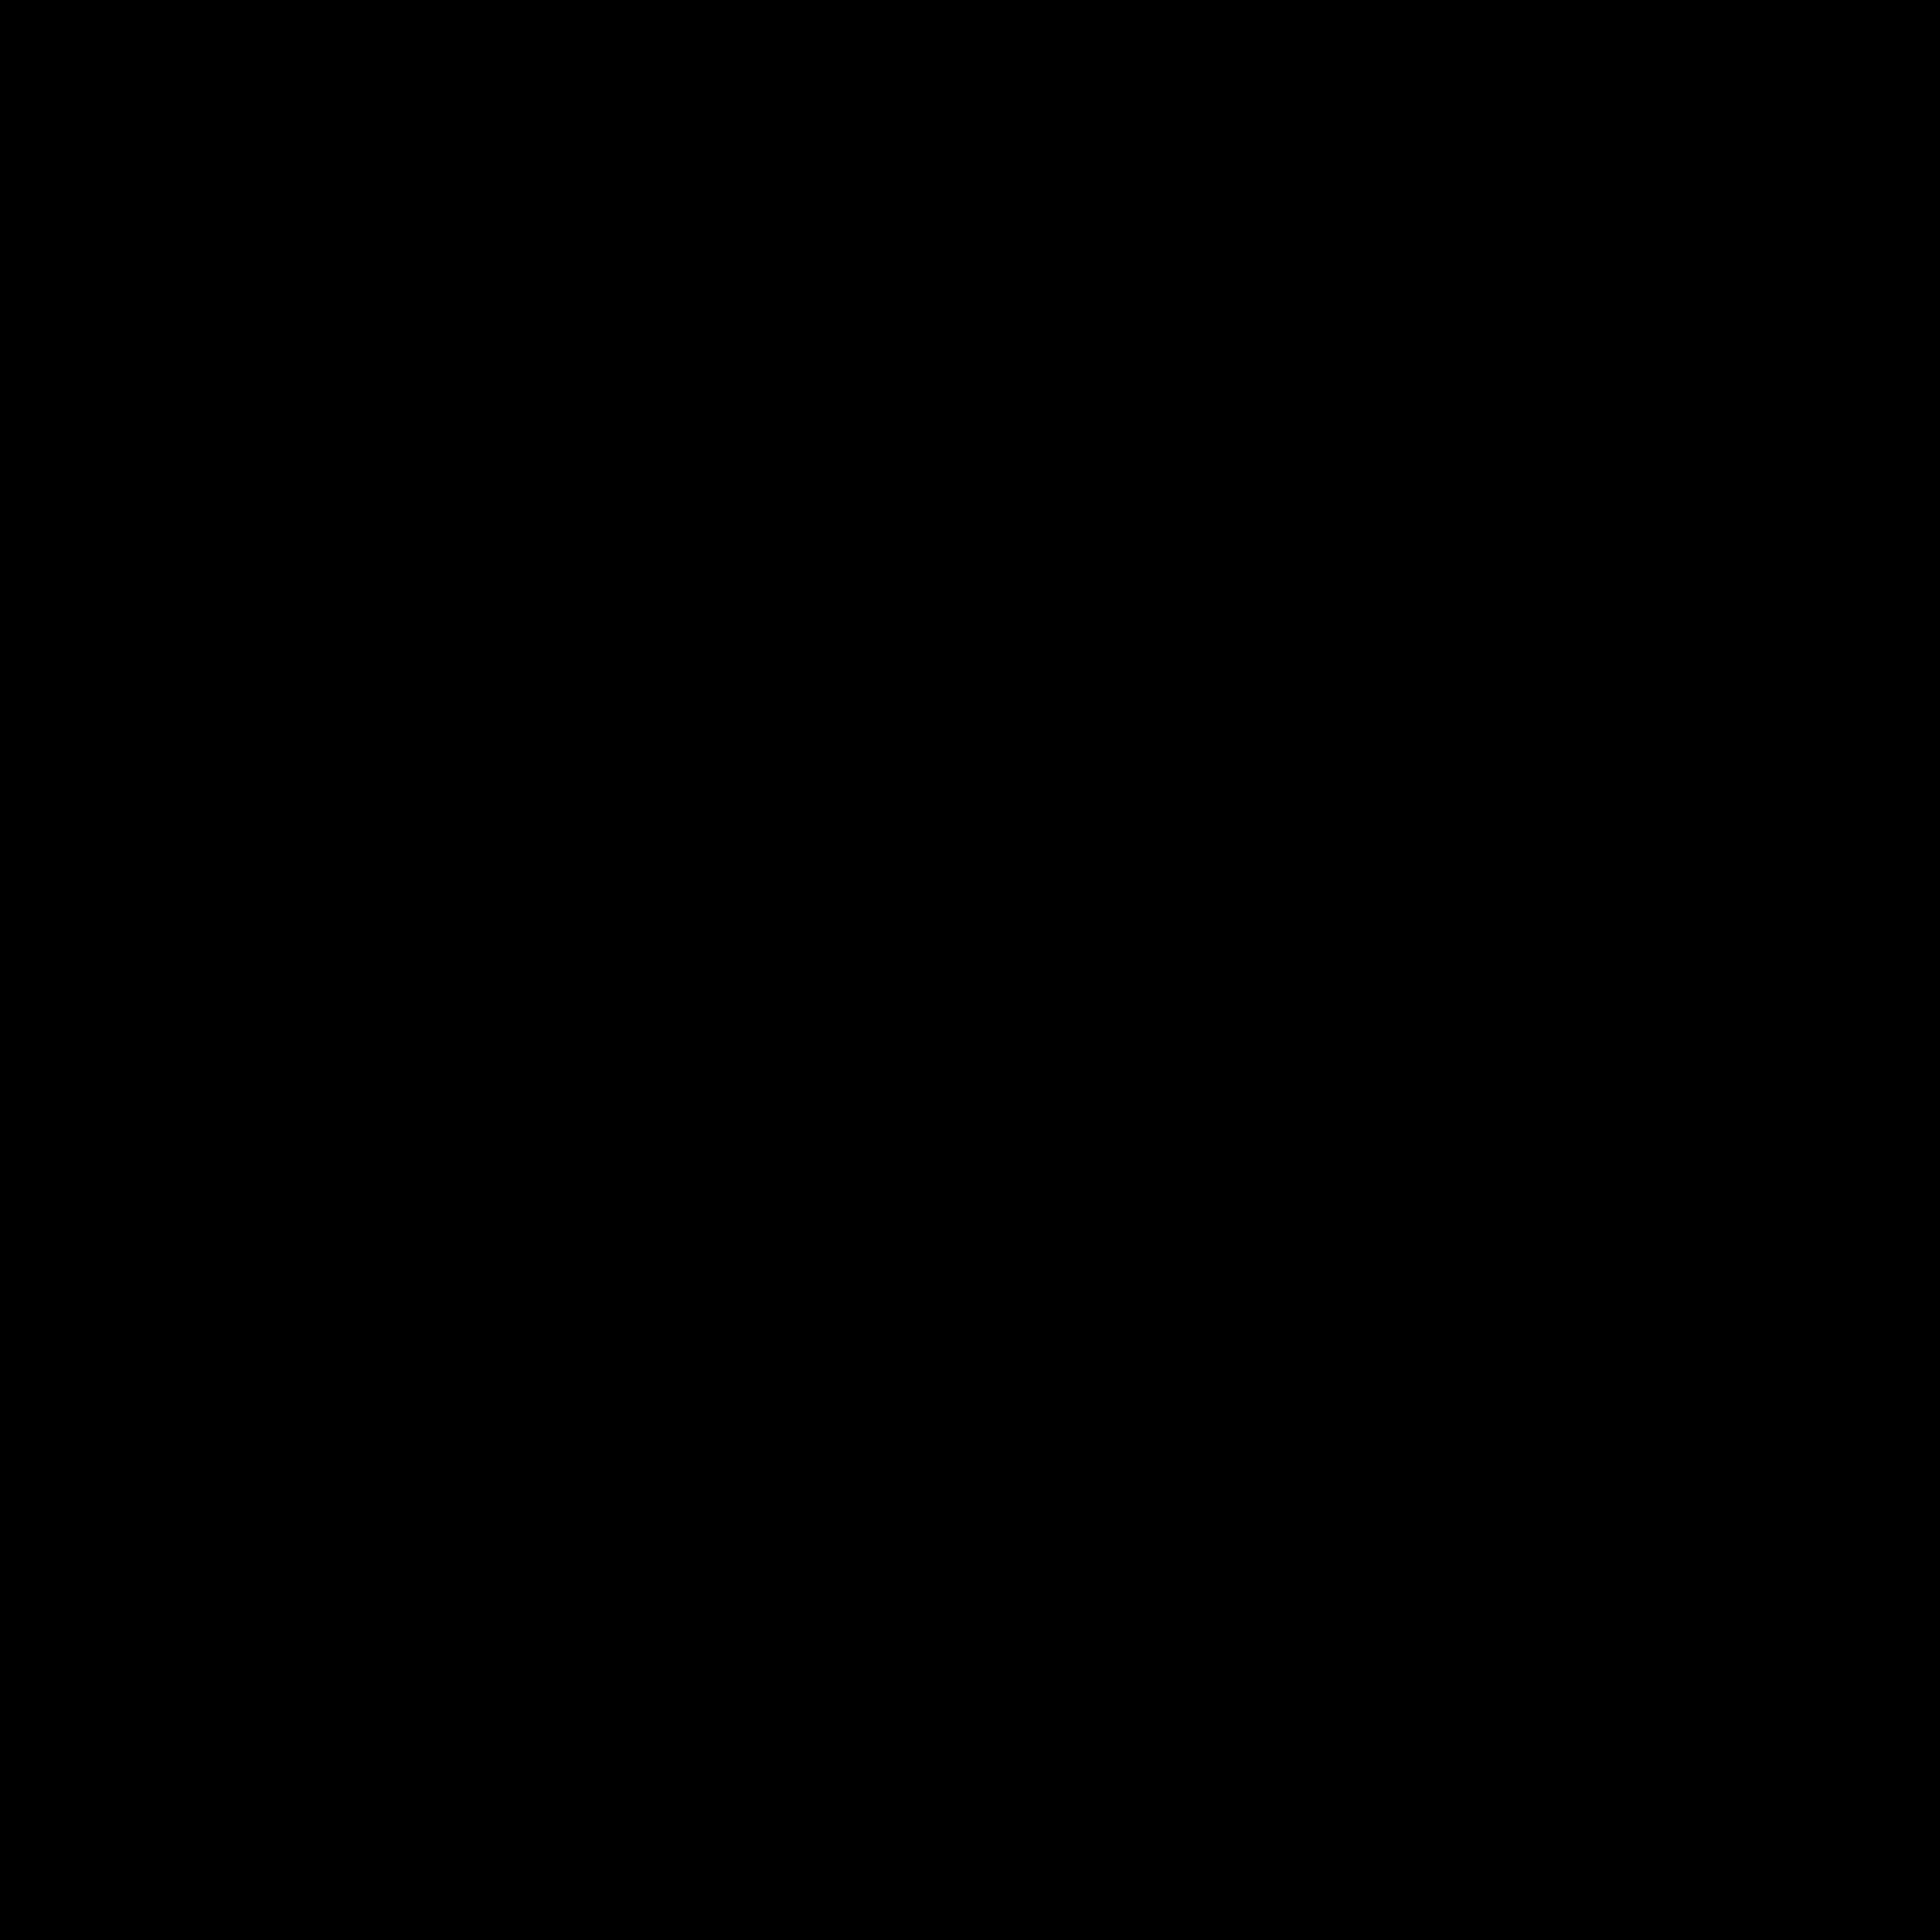 Ktm Racing Logo Png Transparent & Svg Vector - Pluspng Pluspng.com - Ktm Racing Logo PNG